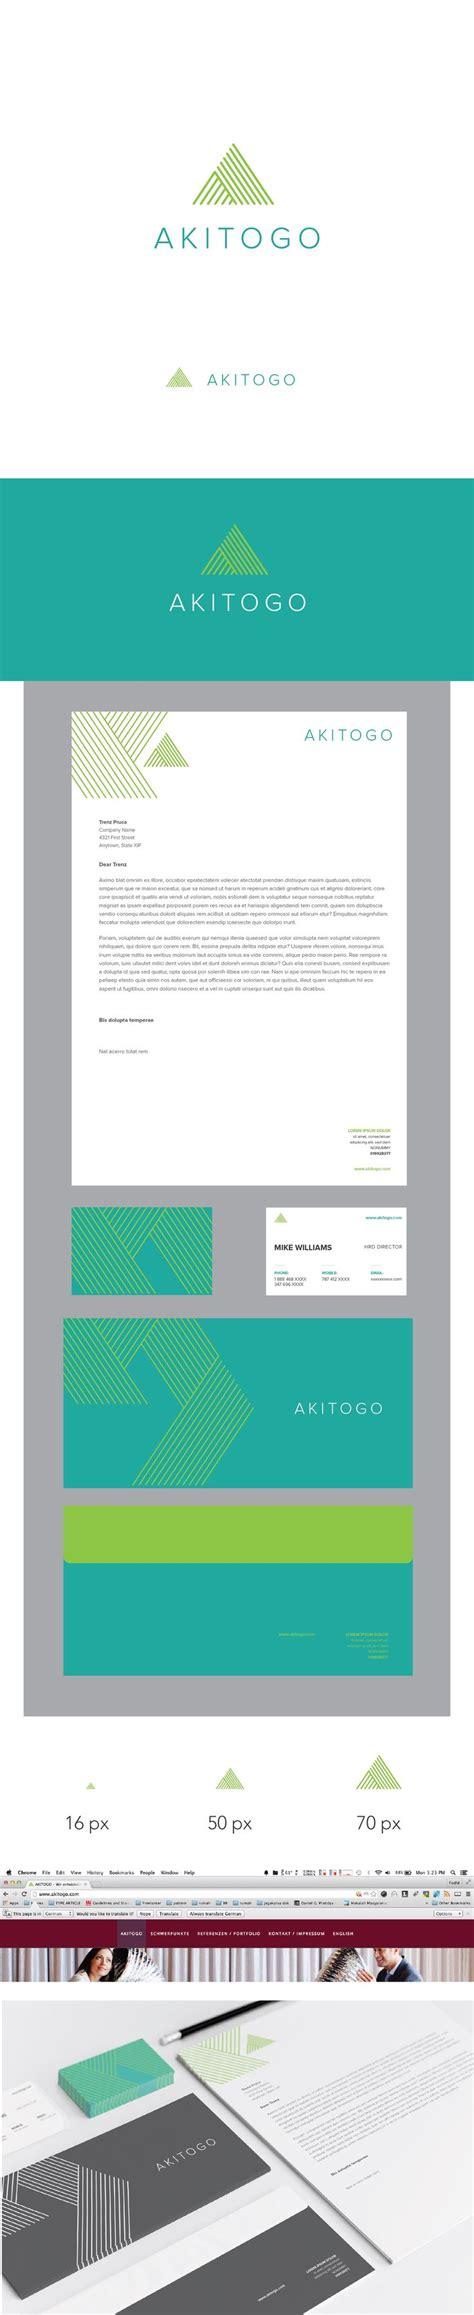 business card letterhead design inspiration 25 gorgeous letterhead design ideas on